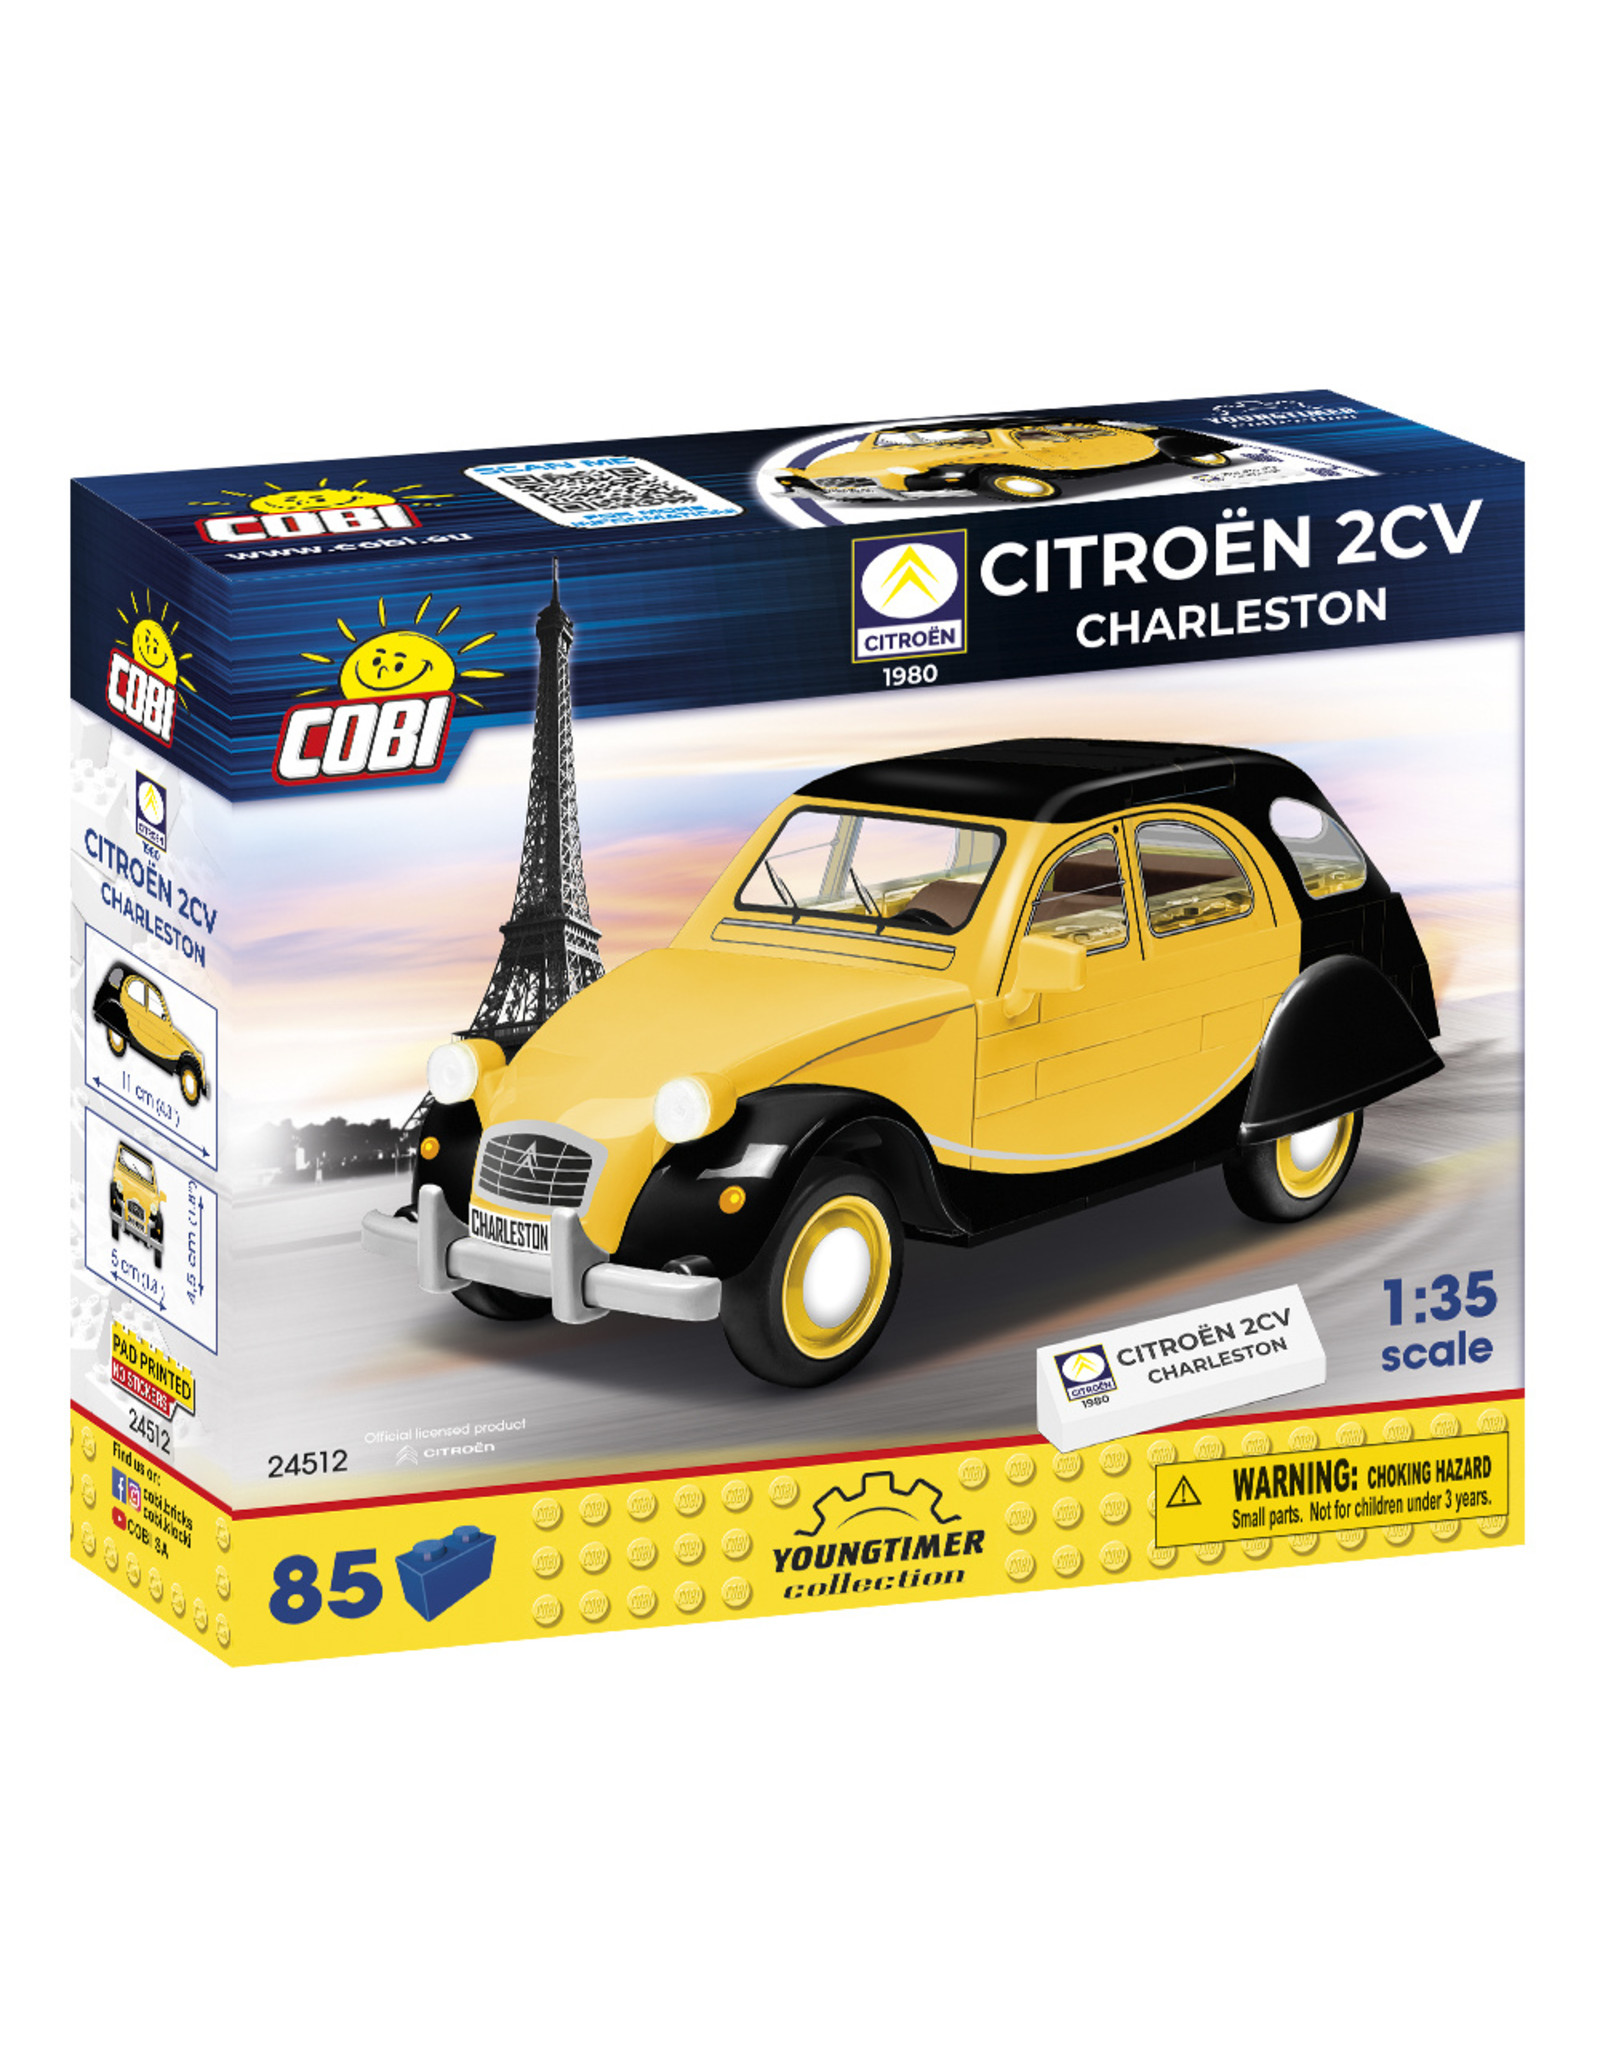 COBI COBI 24511 - Citroën 2CV  Charleston